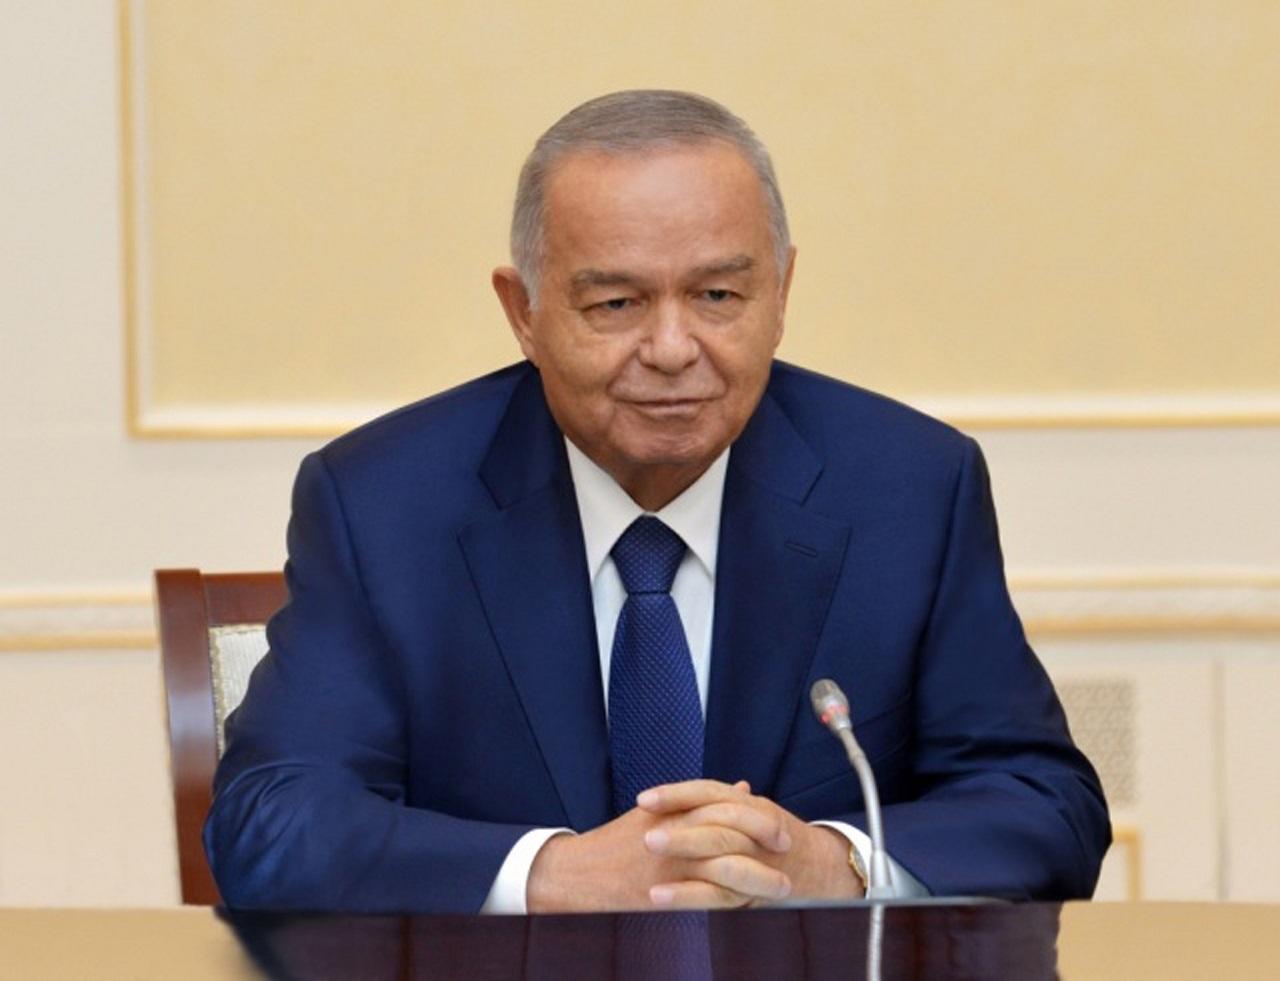 Meghalt Iszlam Karimov